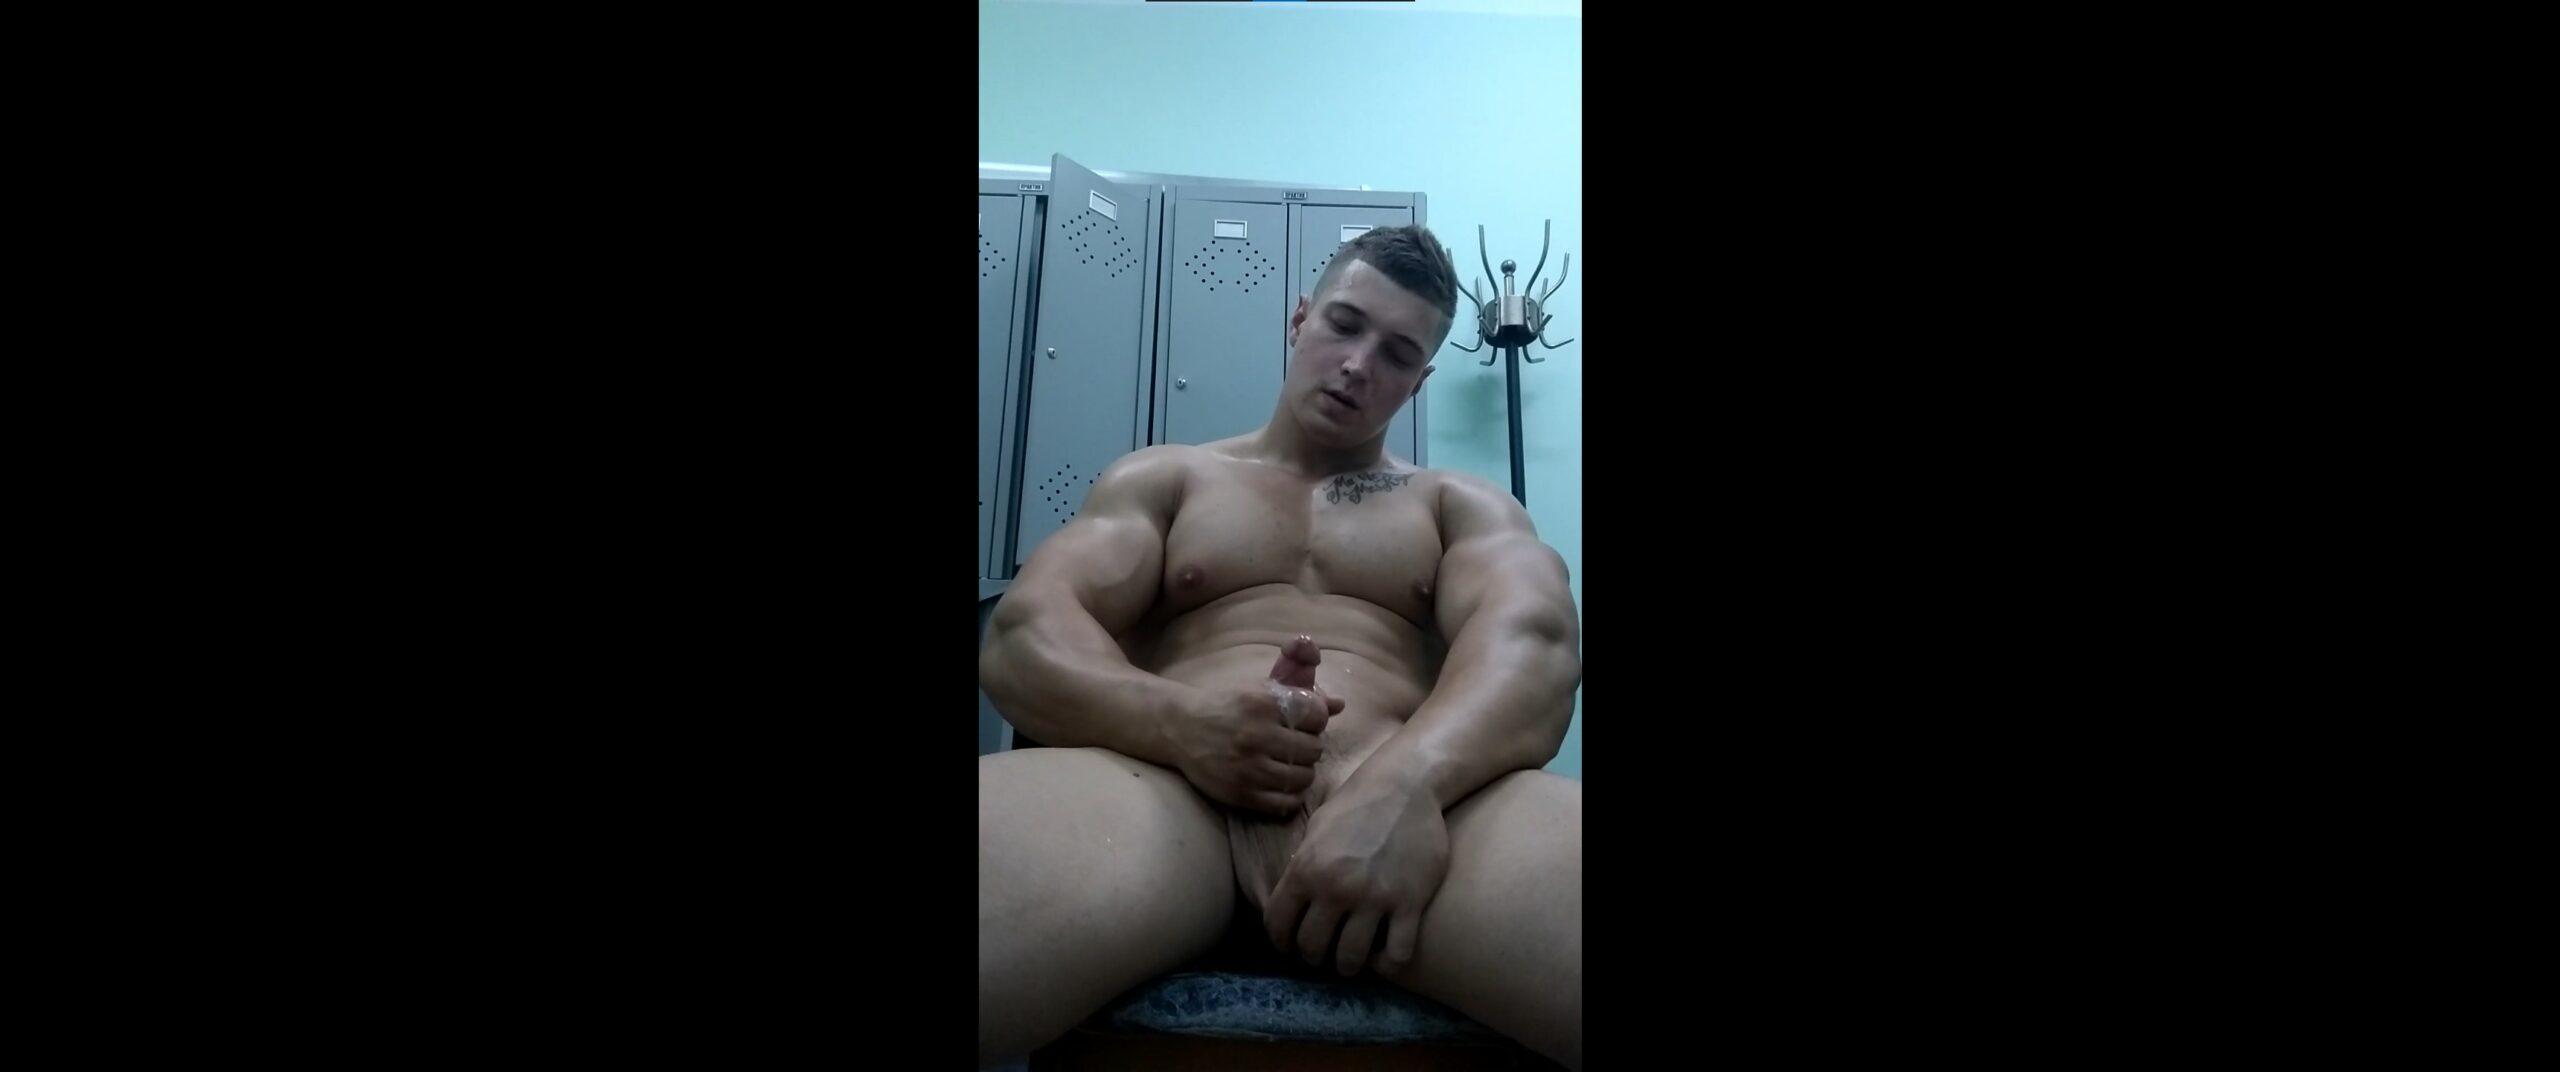 Jerking off after a workout – DenisAlpha – Gay for Fans – gayforfans.com